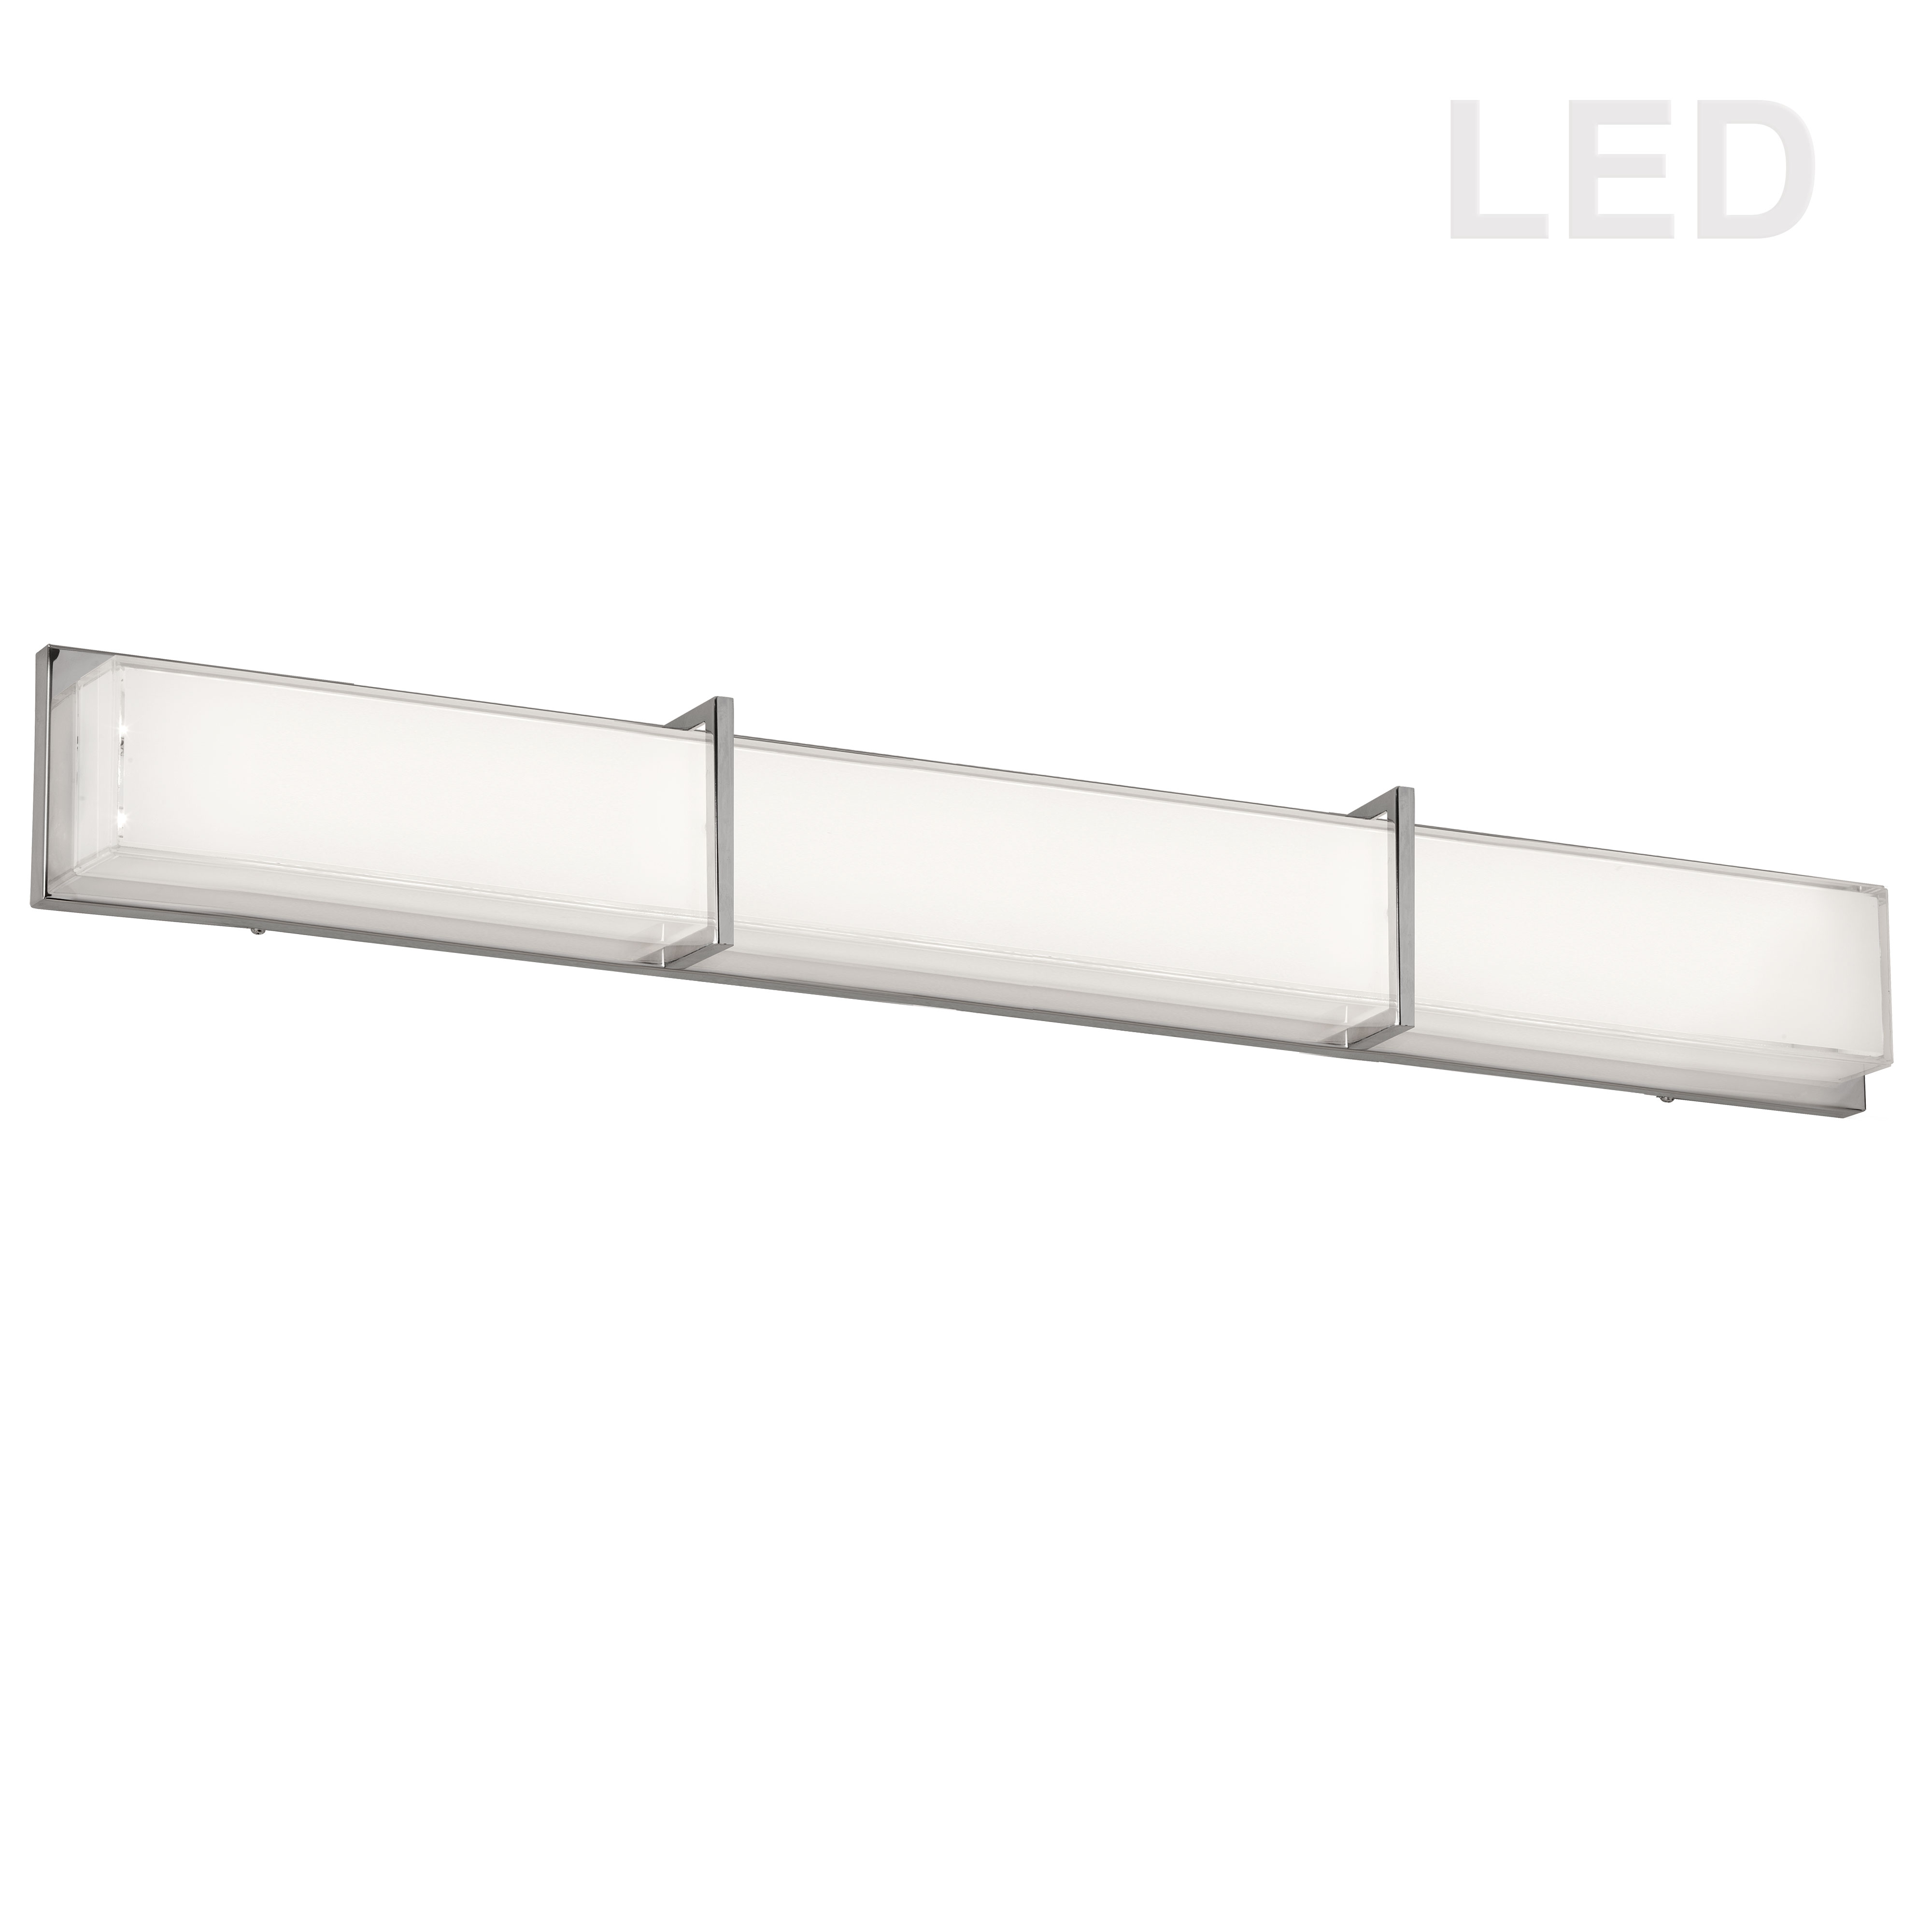 LED Vanity Fixture Polished Chrome White Cased Glass